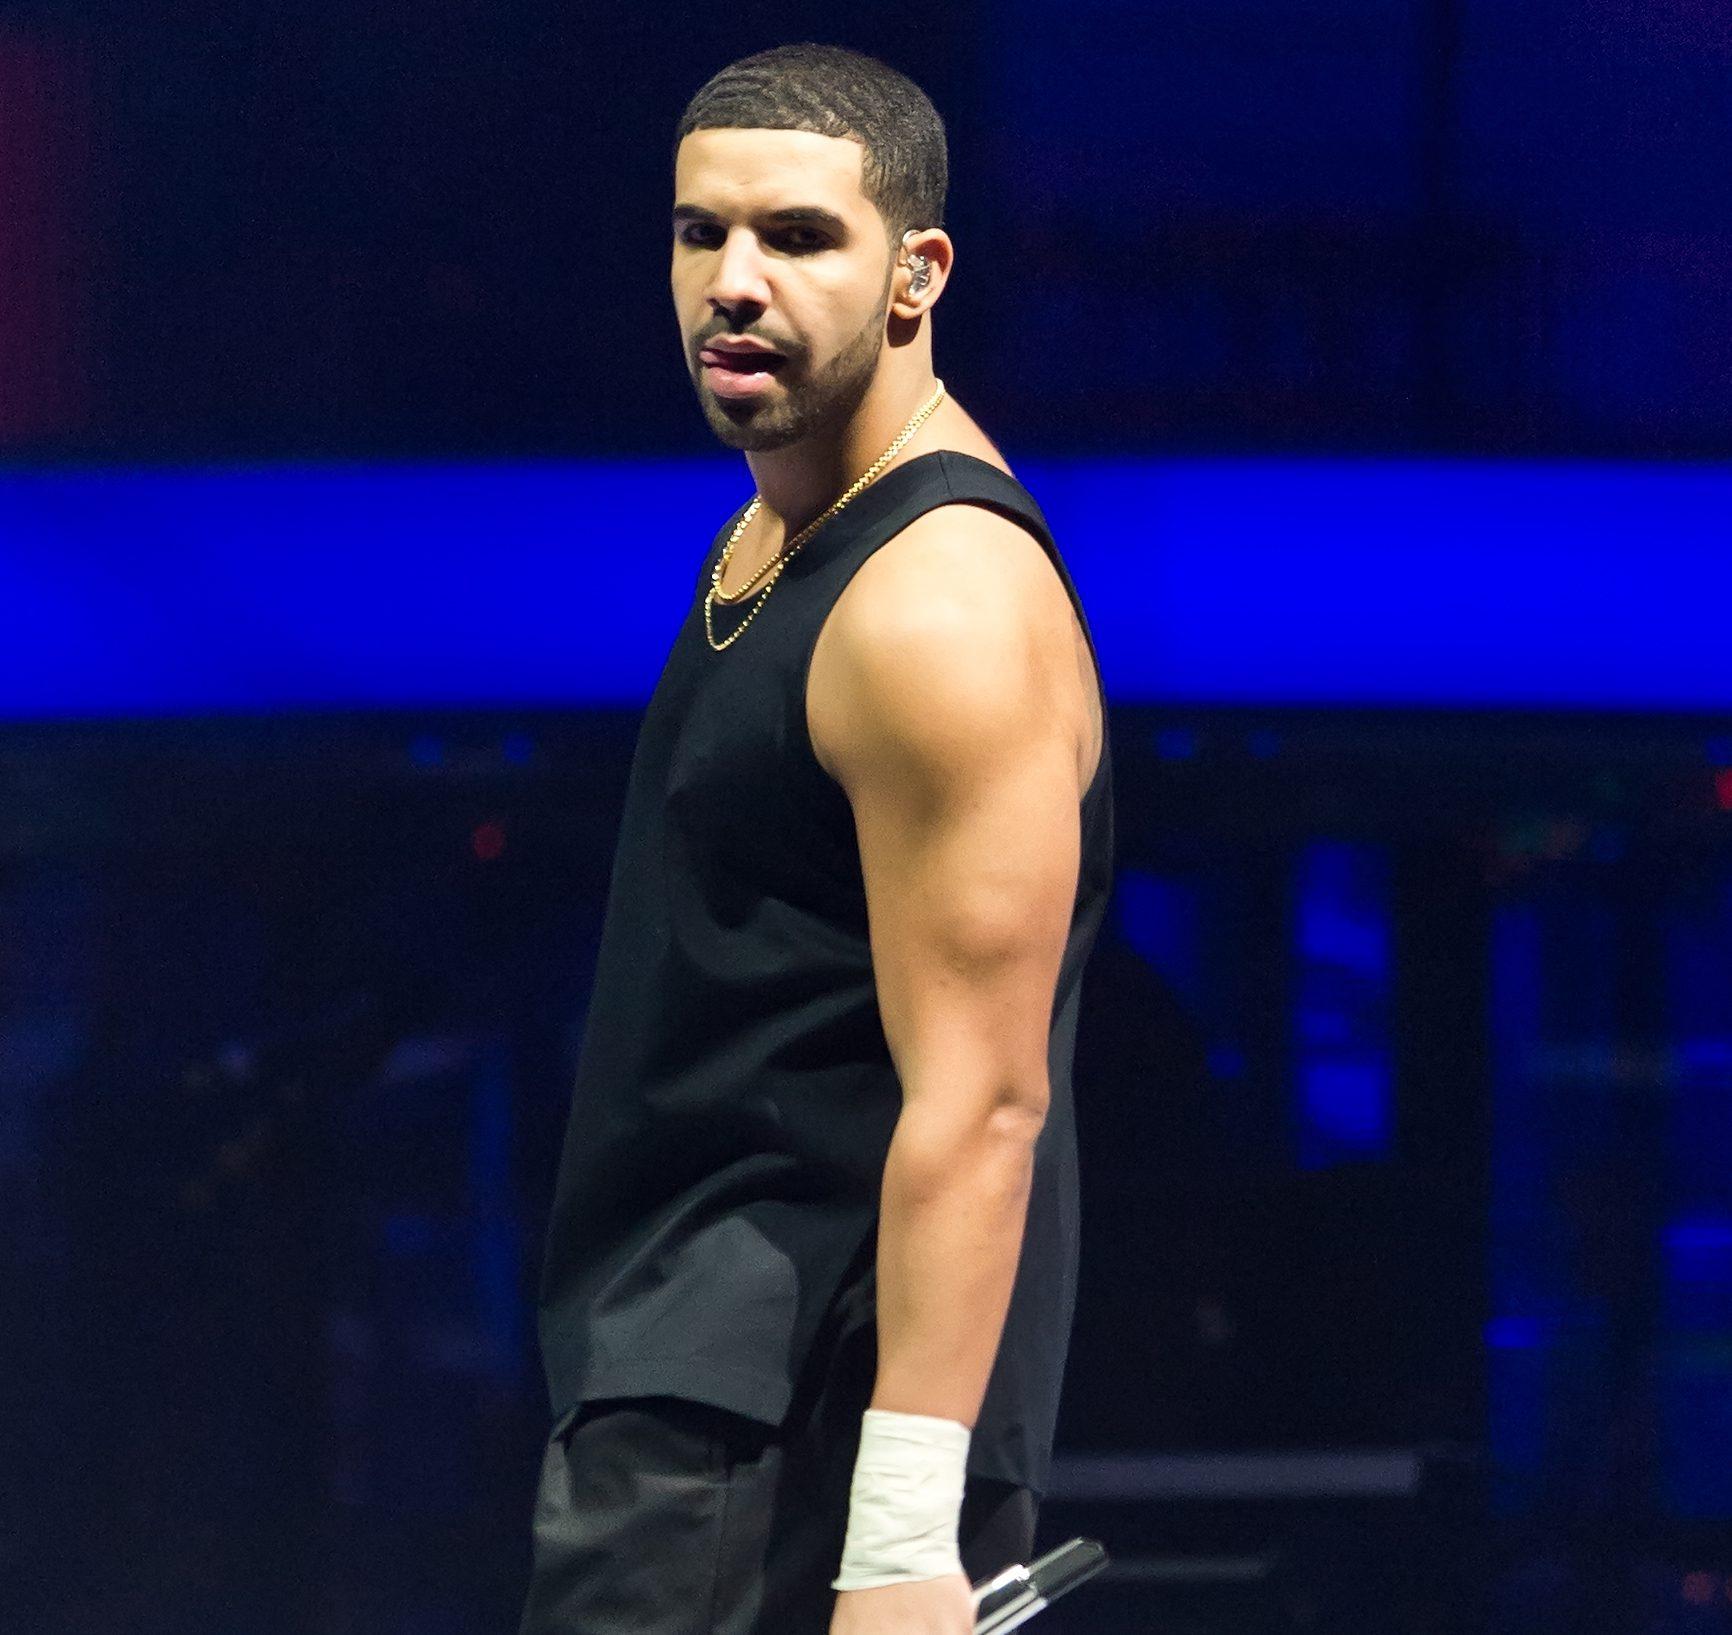 Drake 'Would You Like A Tour? 2013' Concert - Philadelphia, PA